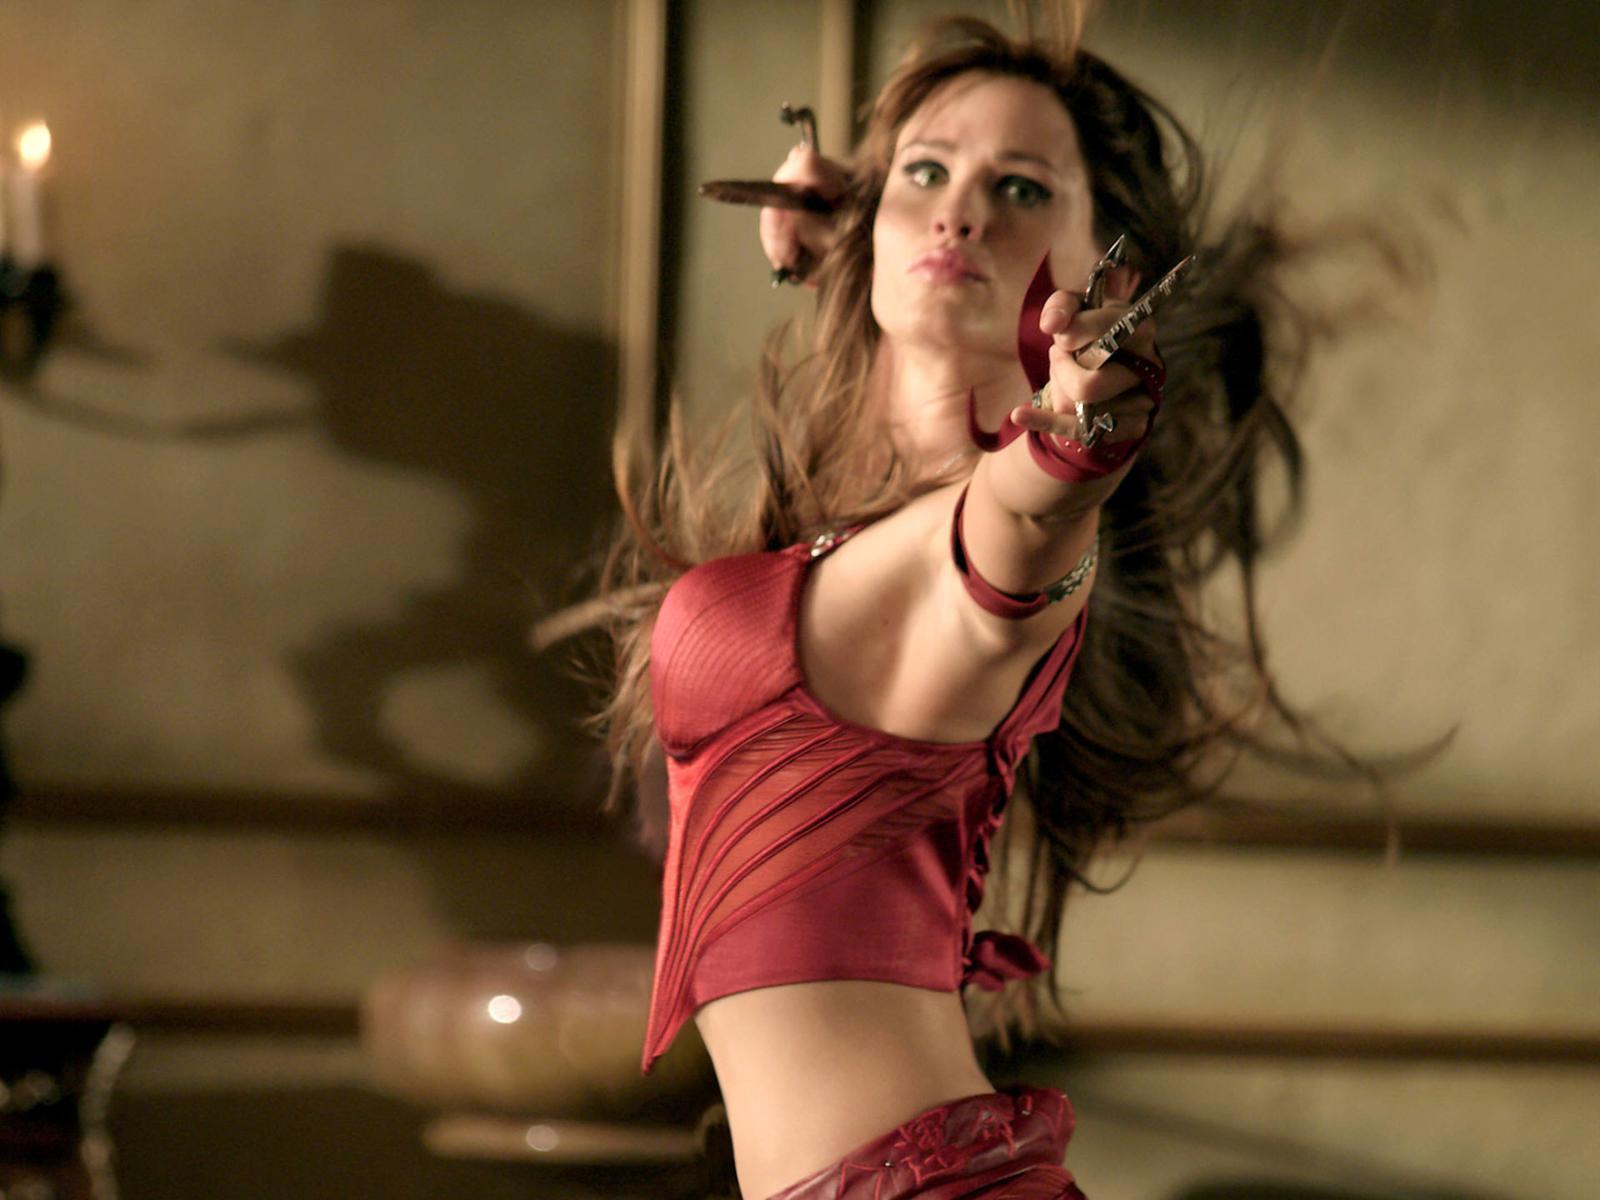 http://3.bp.blogspot.com/-Fvqu3GRbVJA/TlUkxJJ_FcI/AAAAAAAAFuo/nvV-FRhioOk/s1600/jennifer_garner_-sexy-dress-hot_desktop_wallpaper.jpg